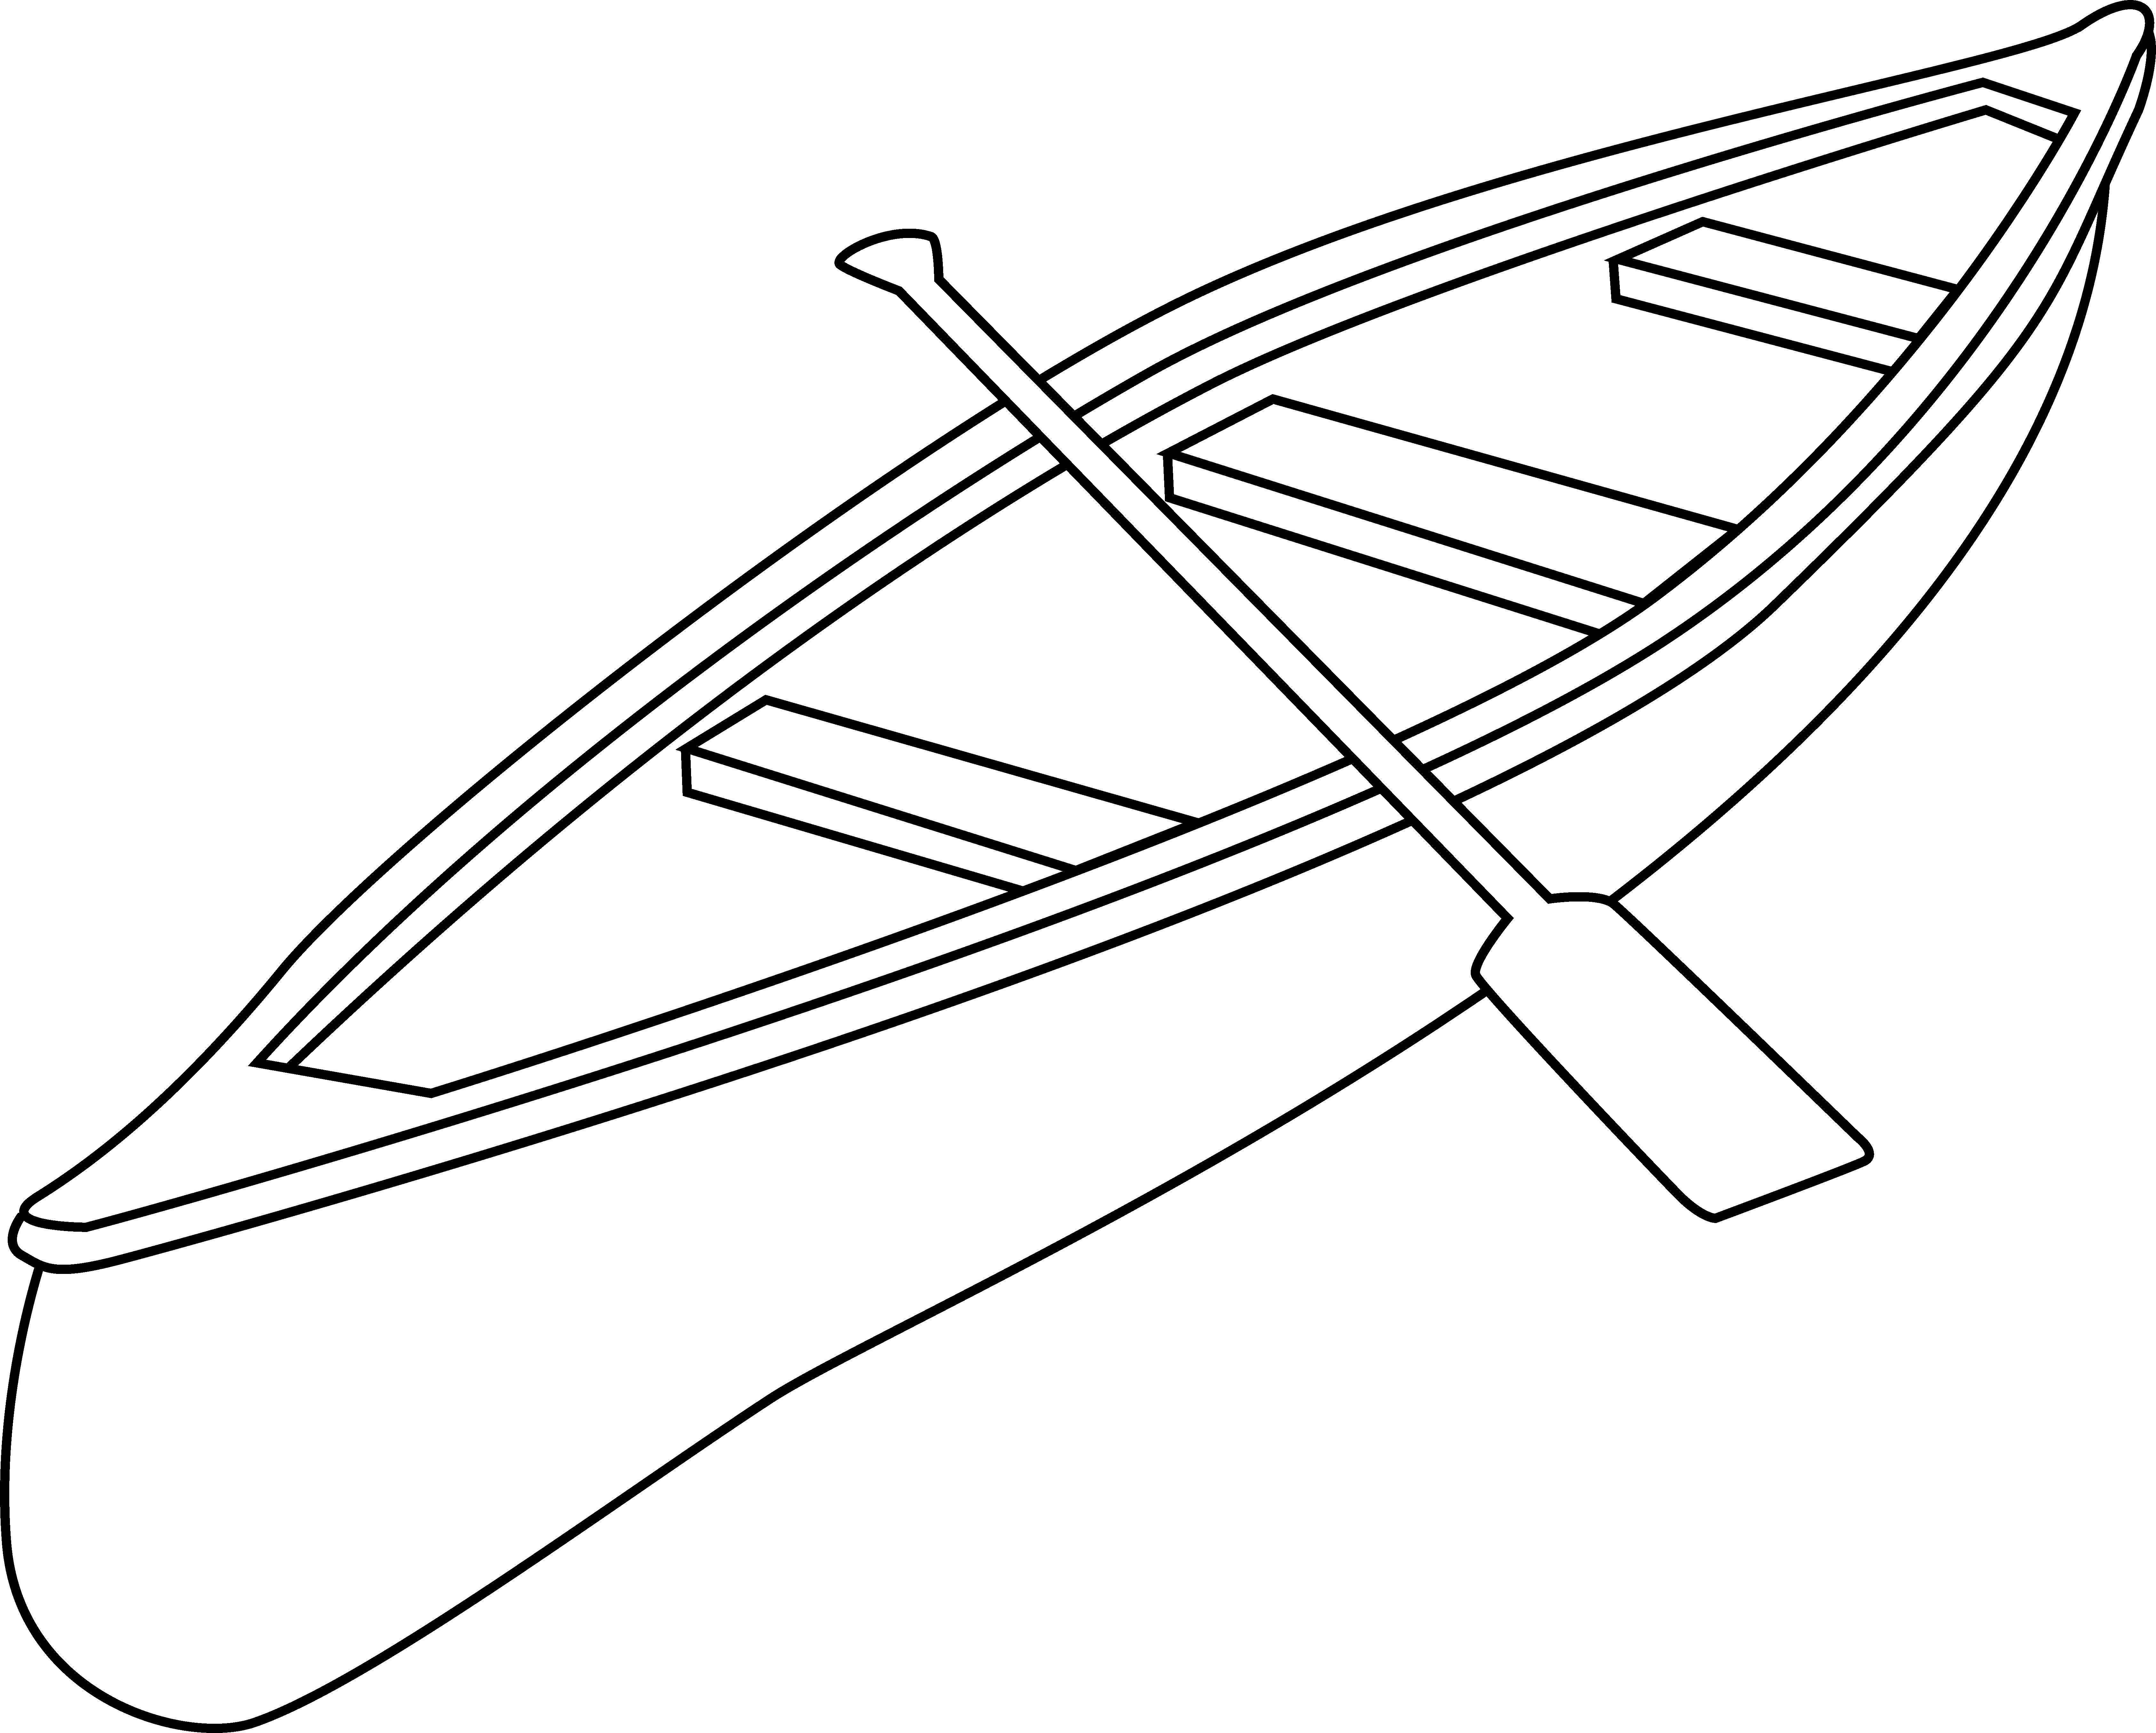 Kayak clipart outline Canoe Party Clip Retirement Art